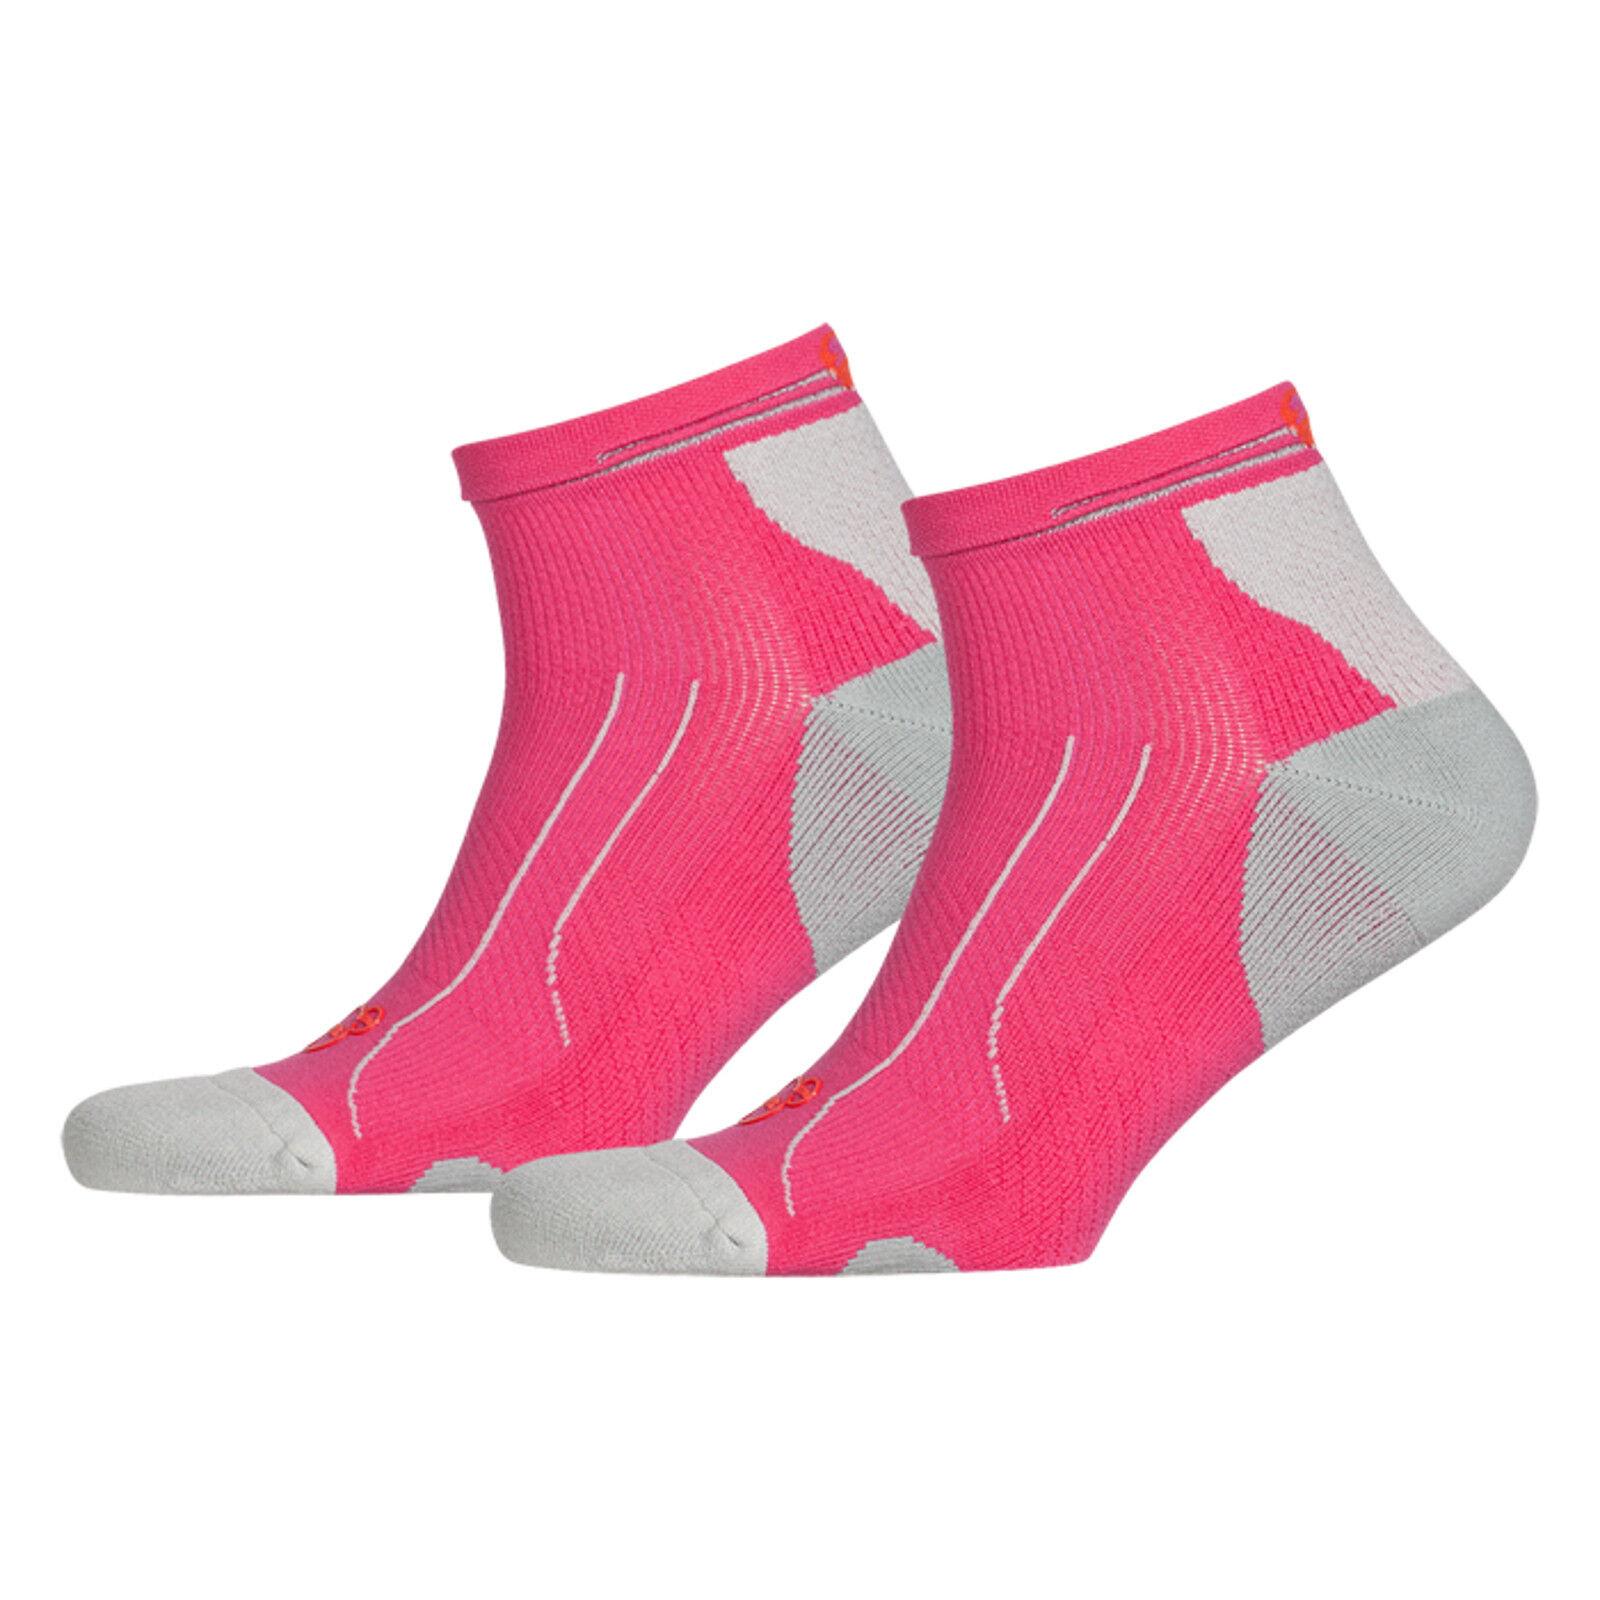 PUMA Sports Socks UK 2.5-5 Cell Light Quarter Performance Running 2 Pair Pack